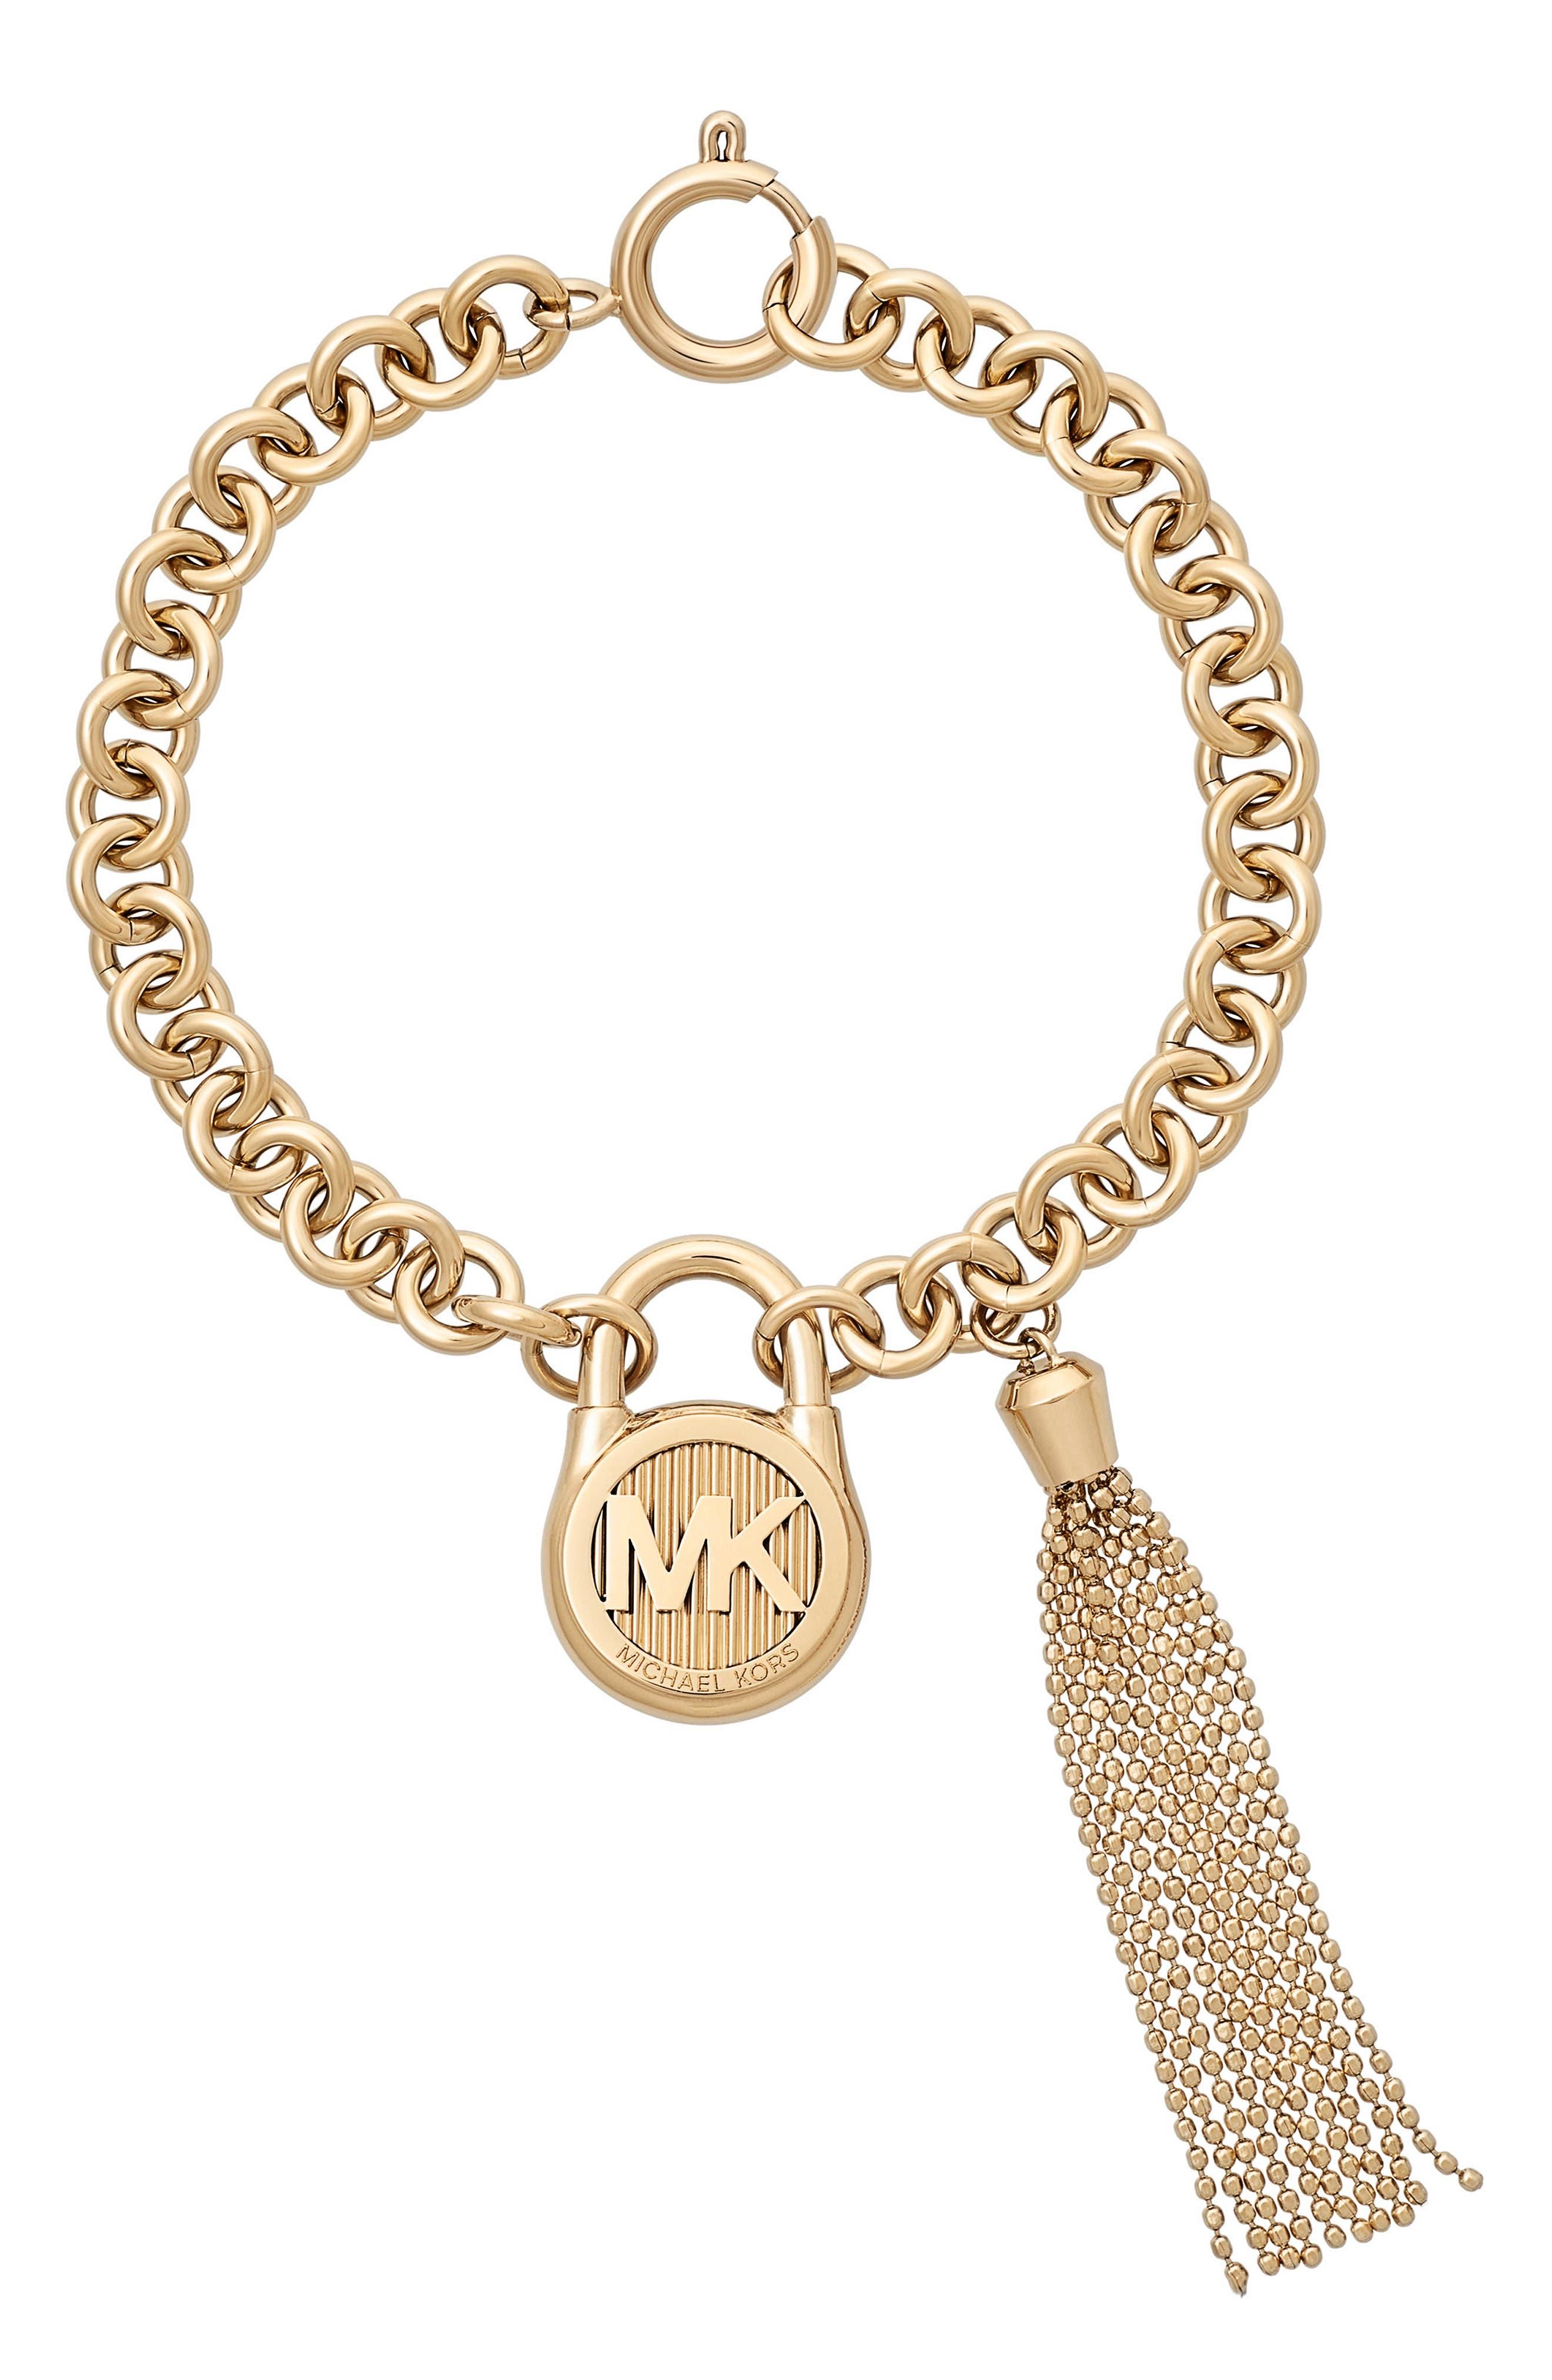 Michael Kors Link Charm Bracelet